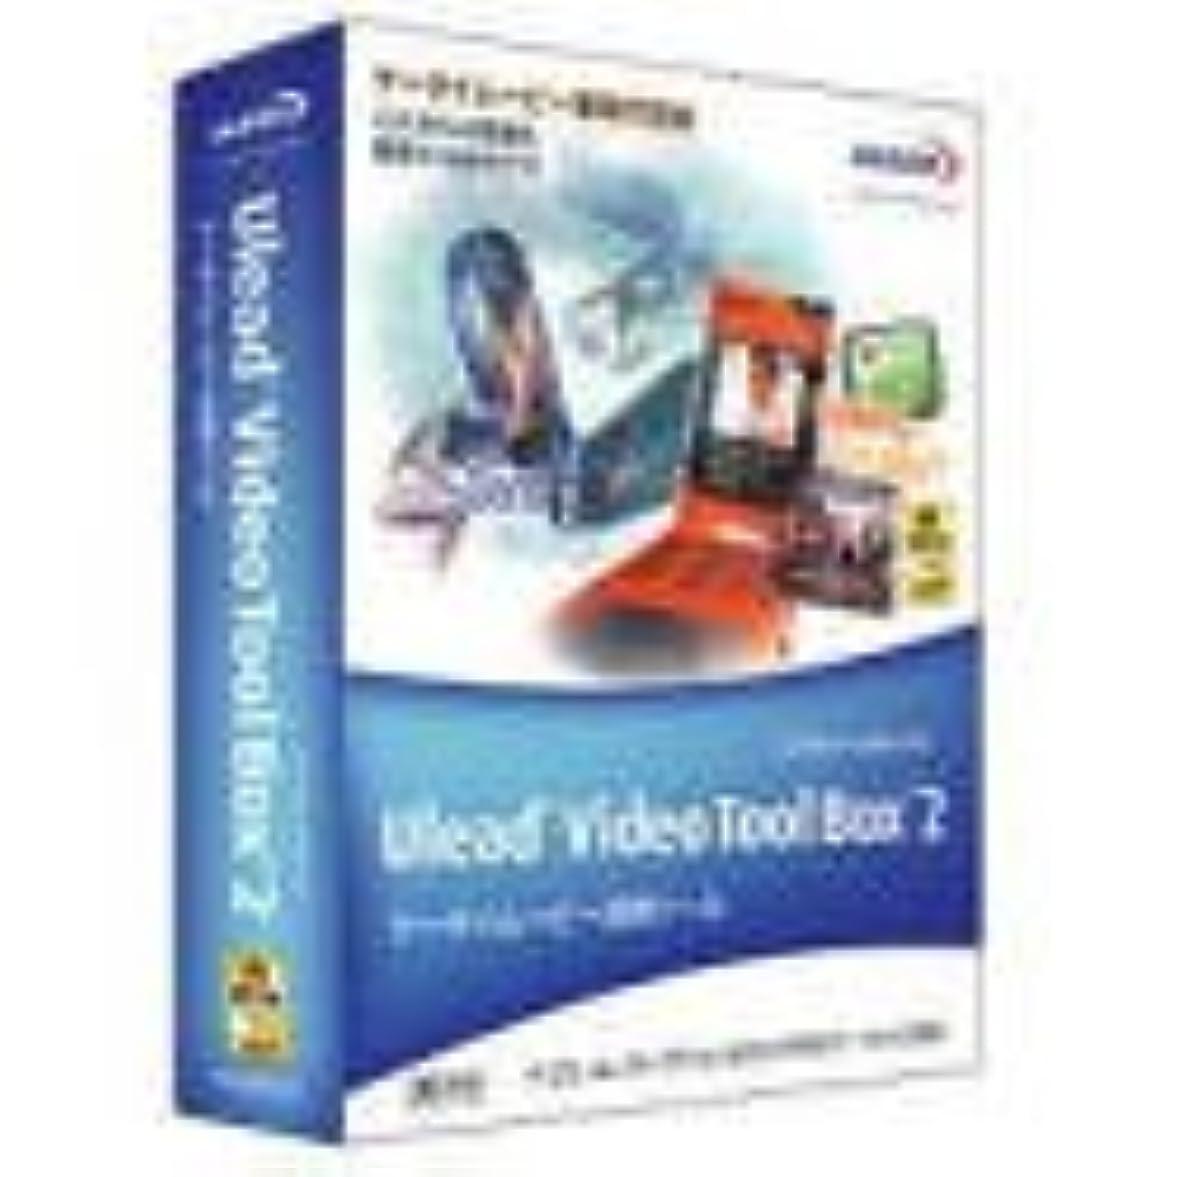 特権的何か祭司Ulead Video ToolBox 2.0 通常版